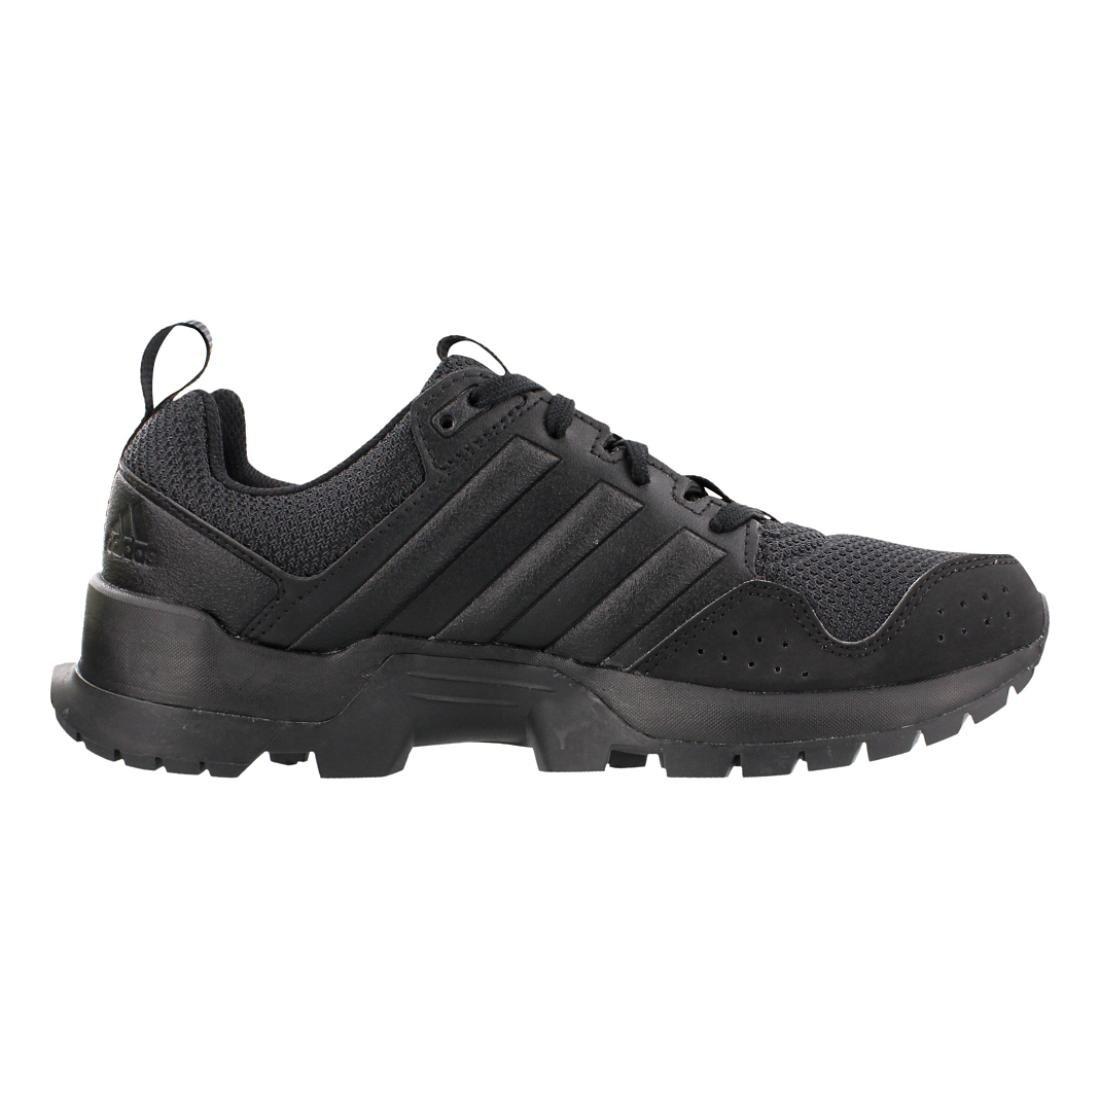 adidas outdoor Women's Gsg9 Trail Running Shoe B0116E6YRG 6.5 B(M) US|Black/Black/Black